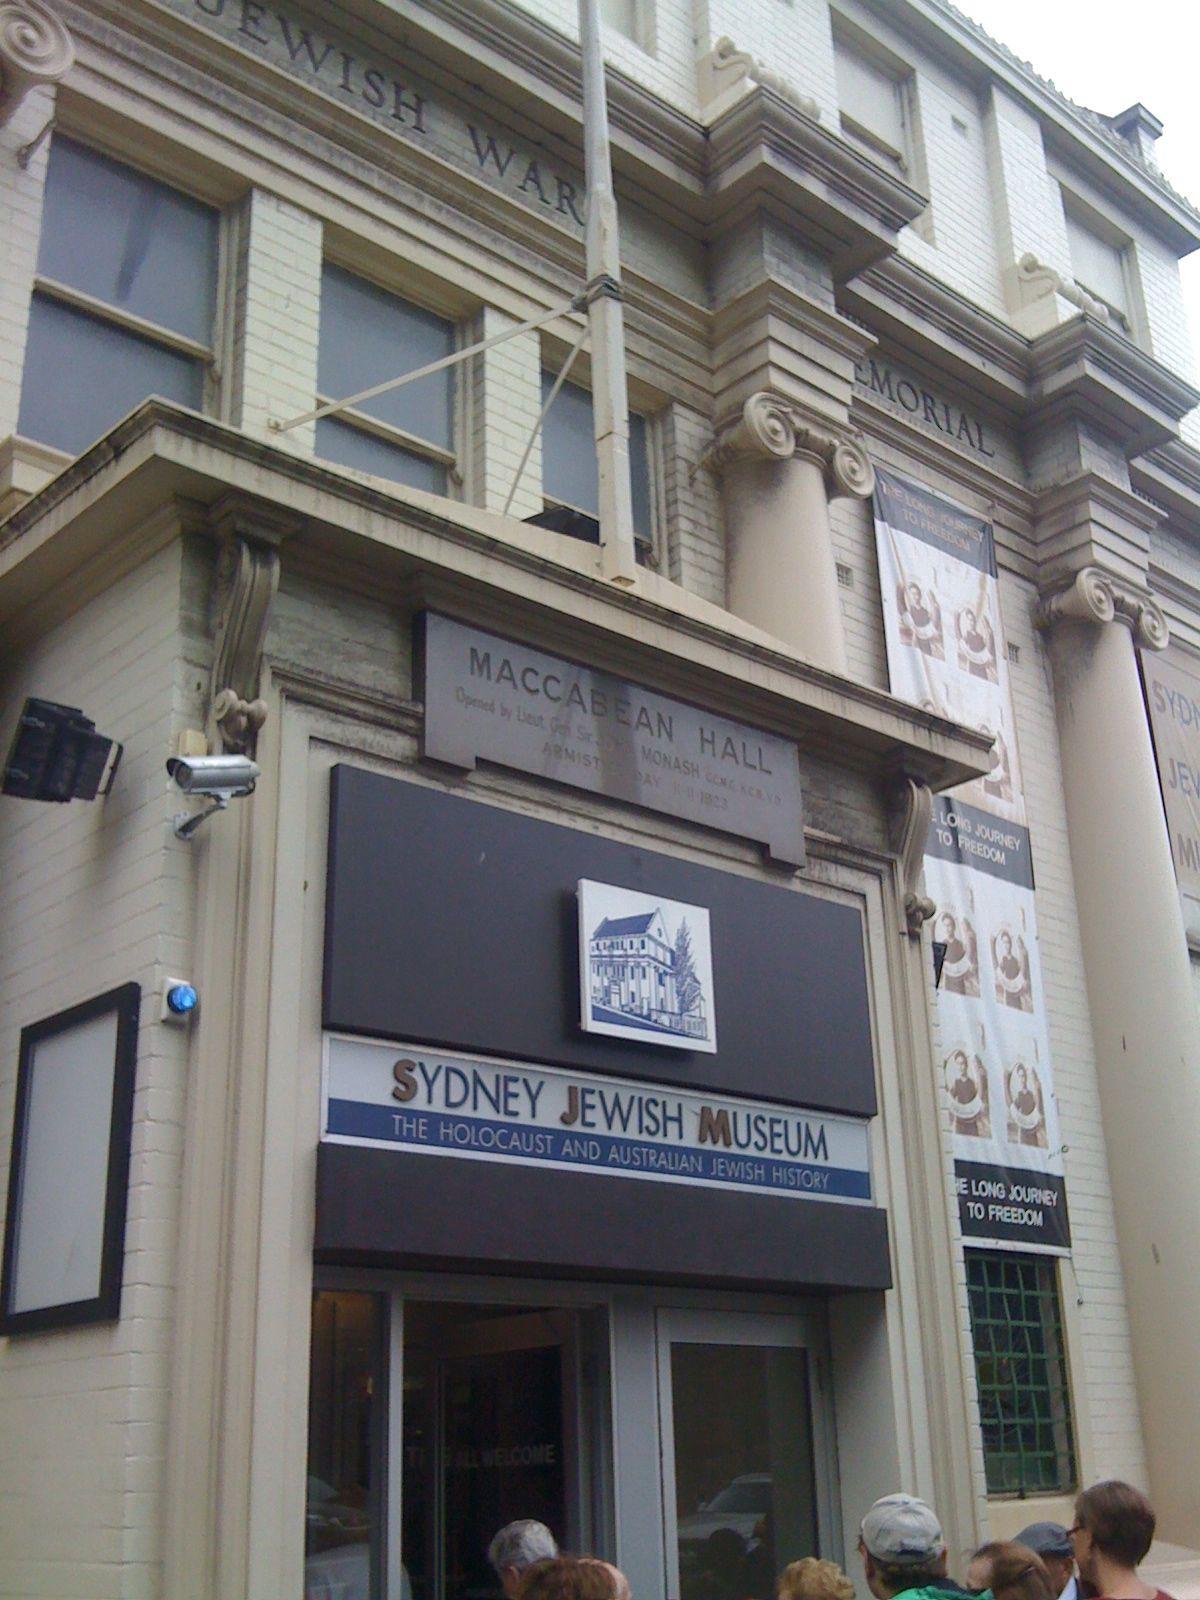 sydney jewish museum contact - photo#16